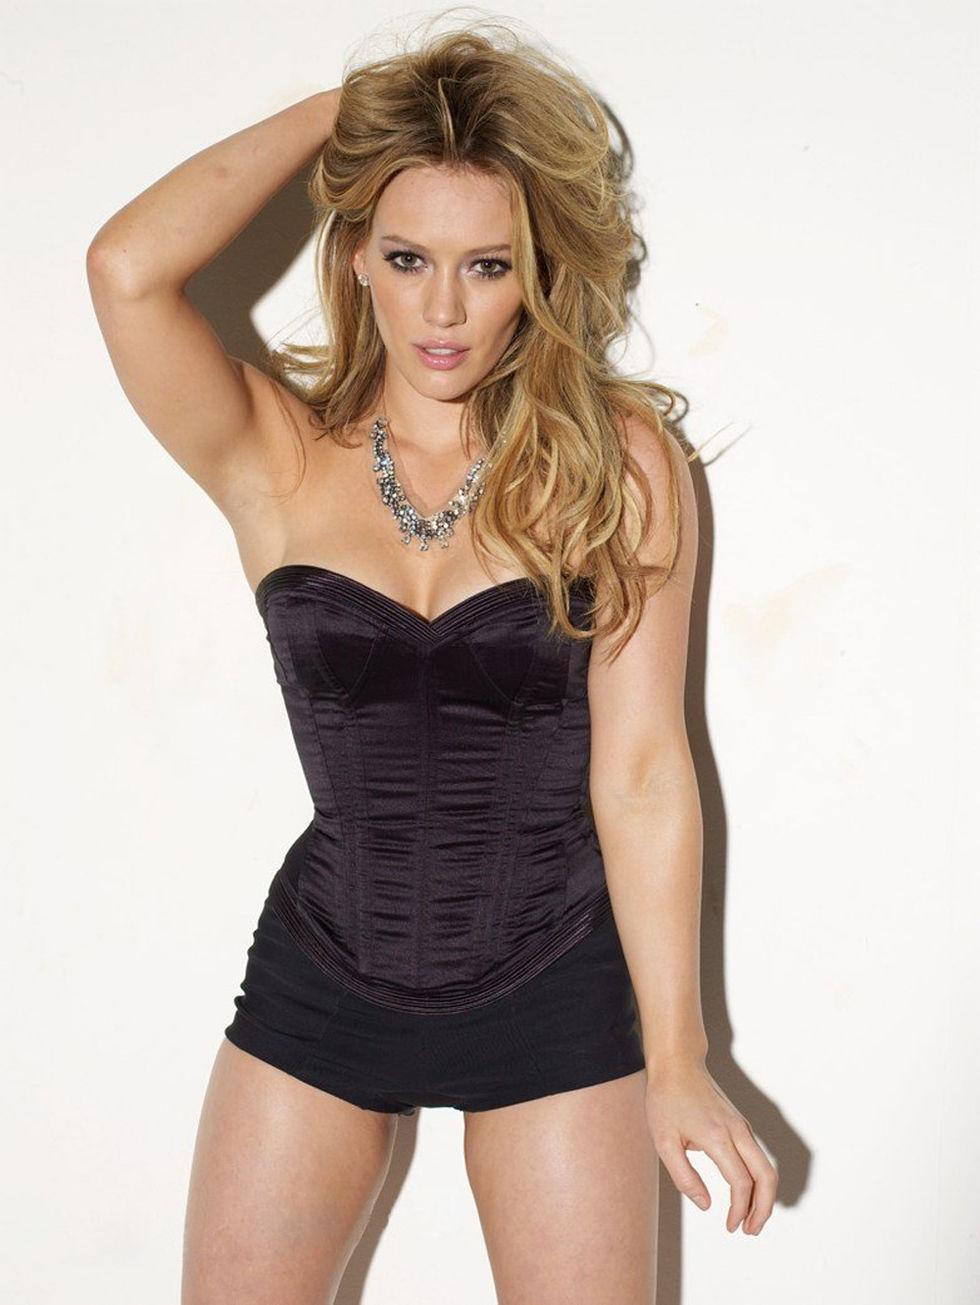 Hilary Duff Backgrounds, Compatible - PC, Mobile, Gadgets| 980x1305 px